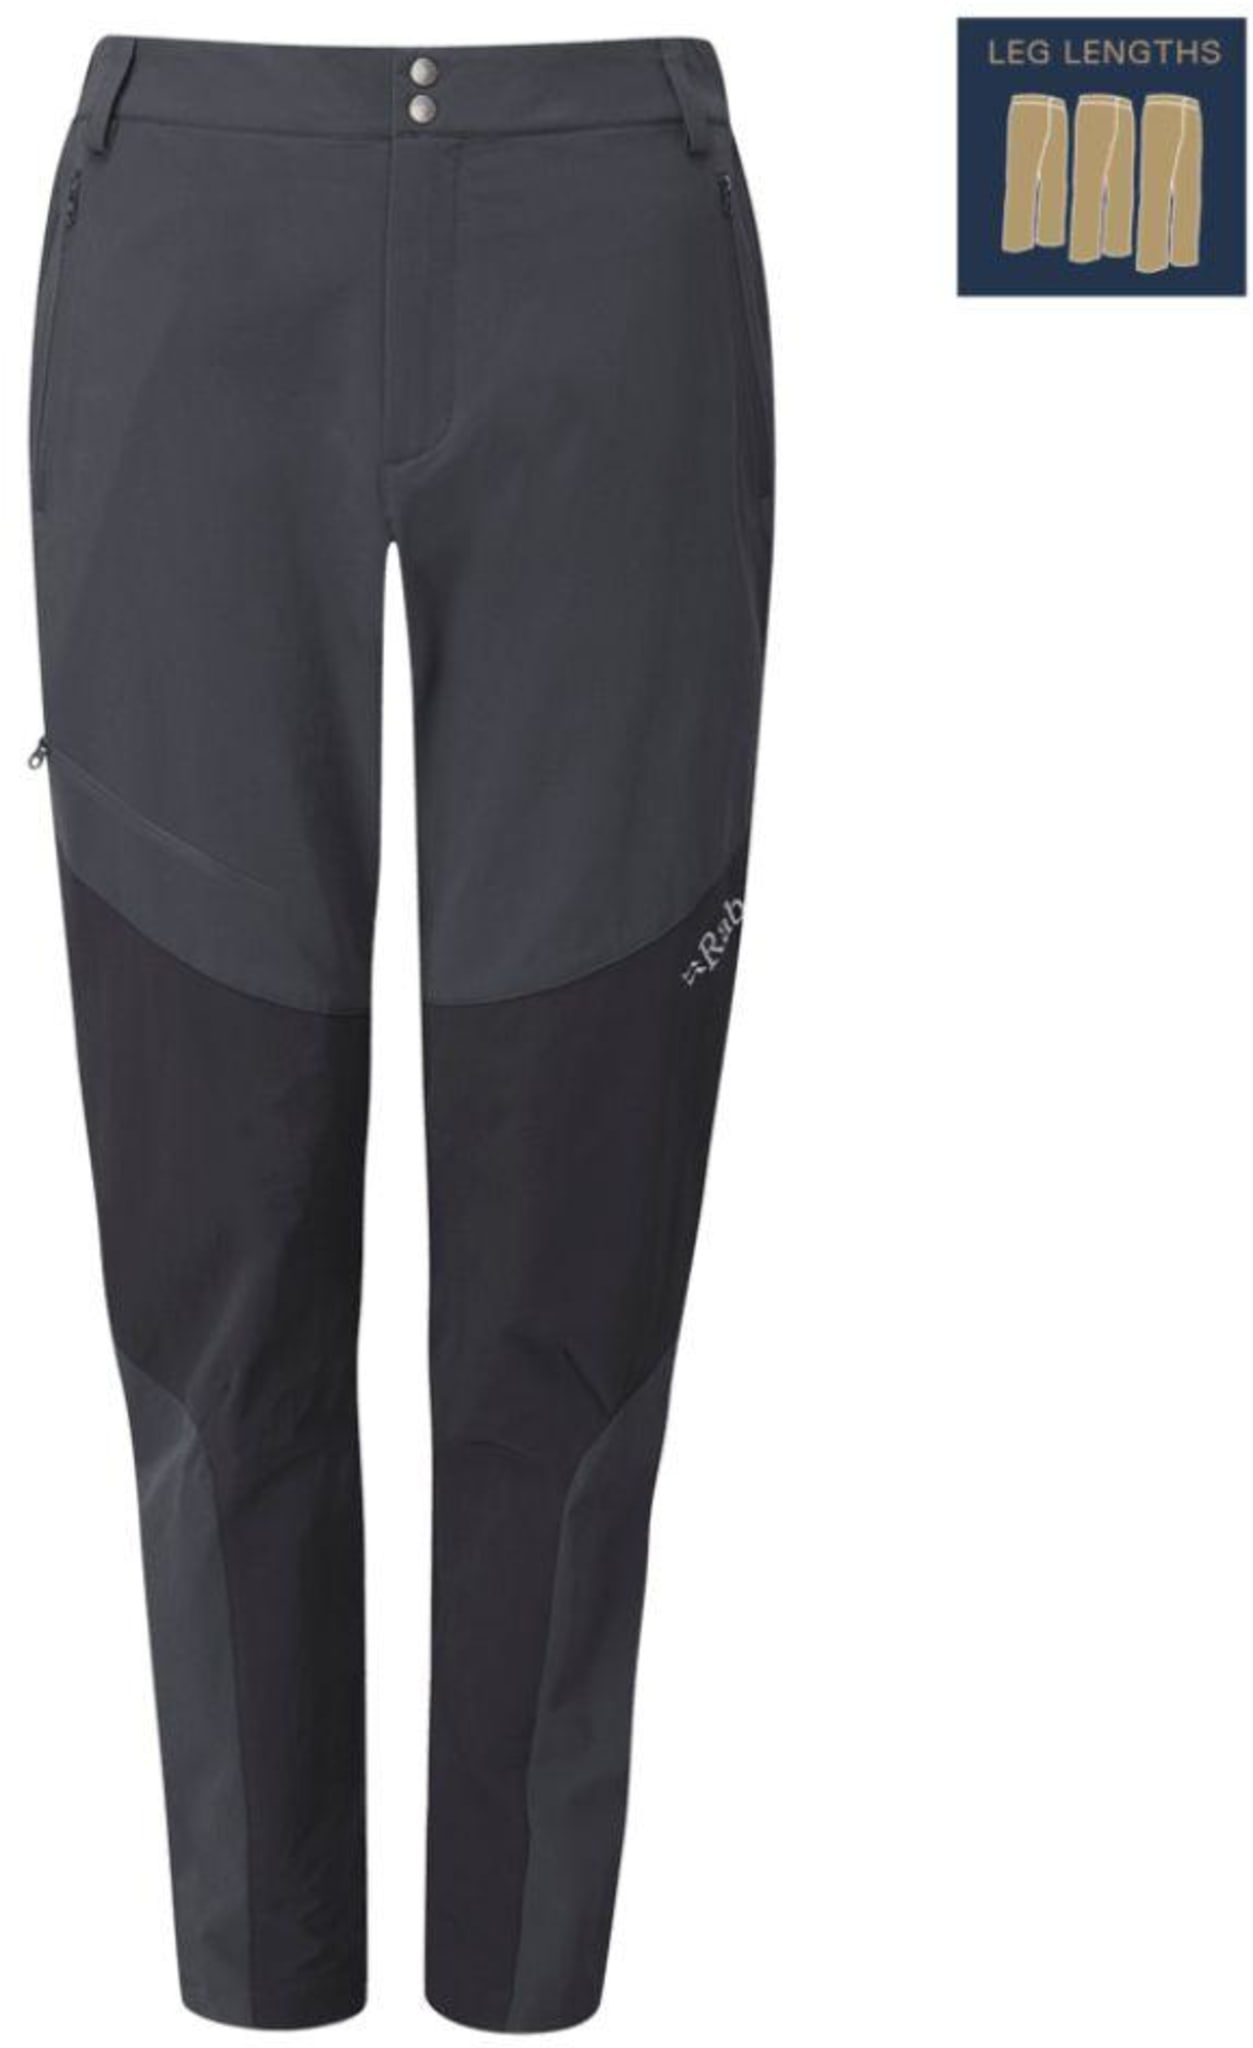 Torque Mountain Pants Ws